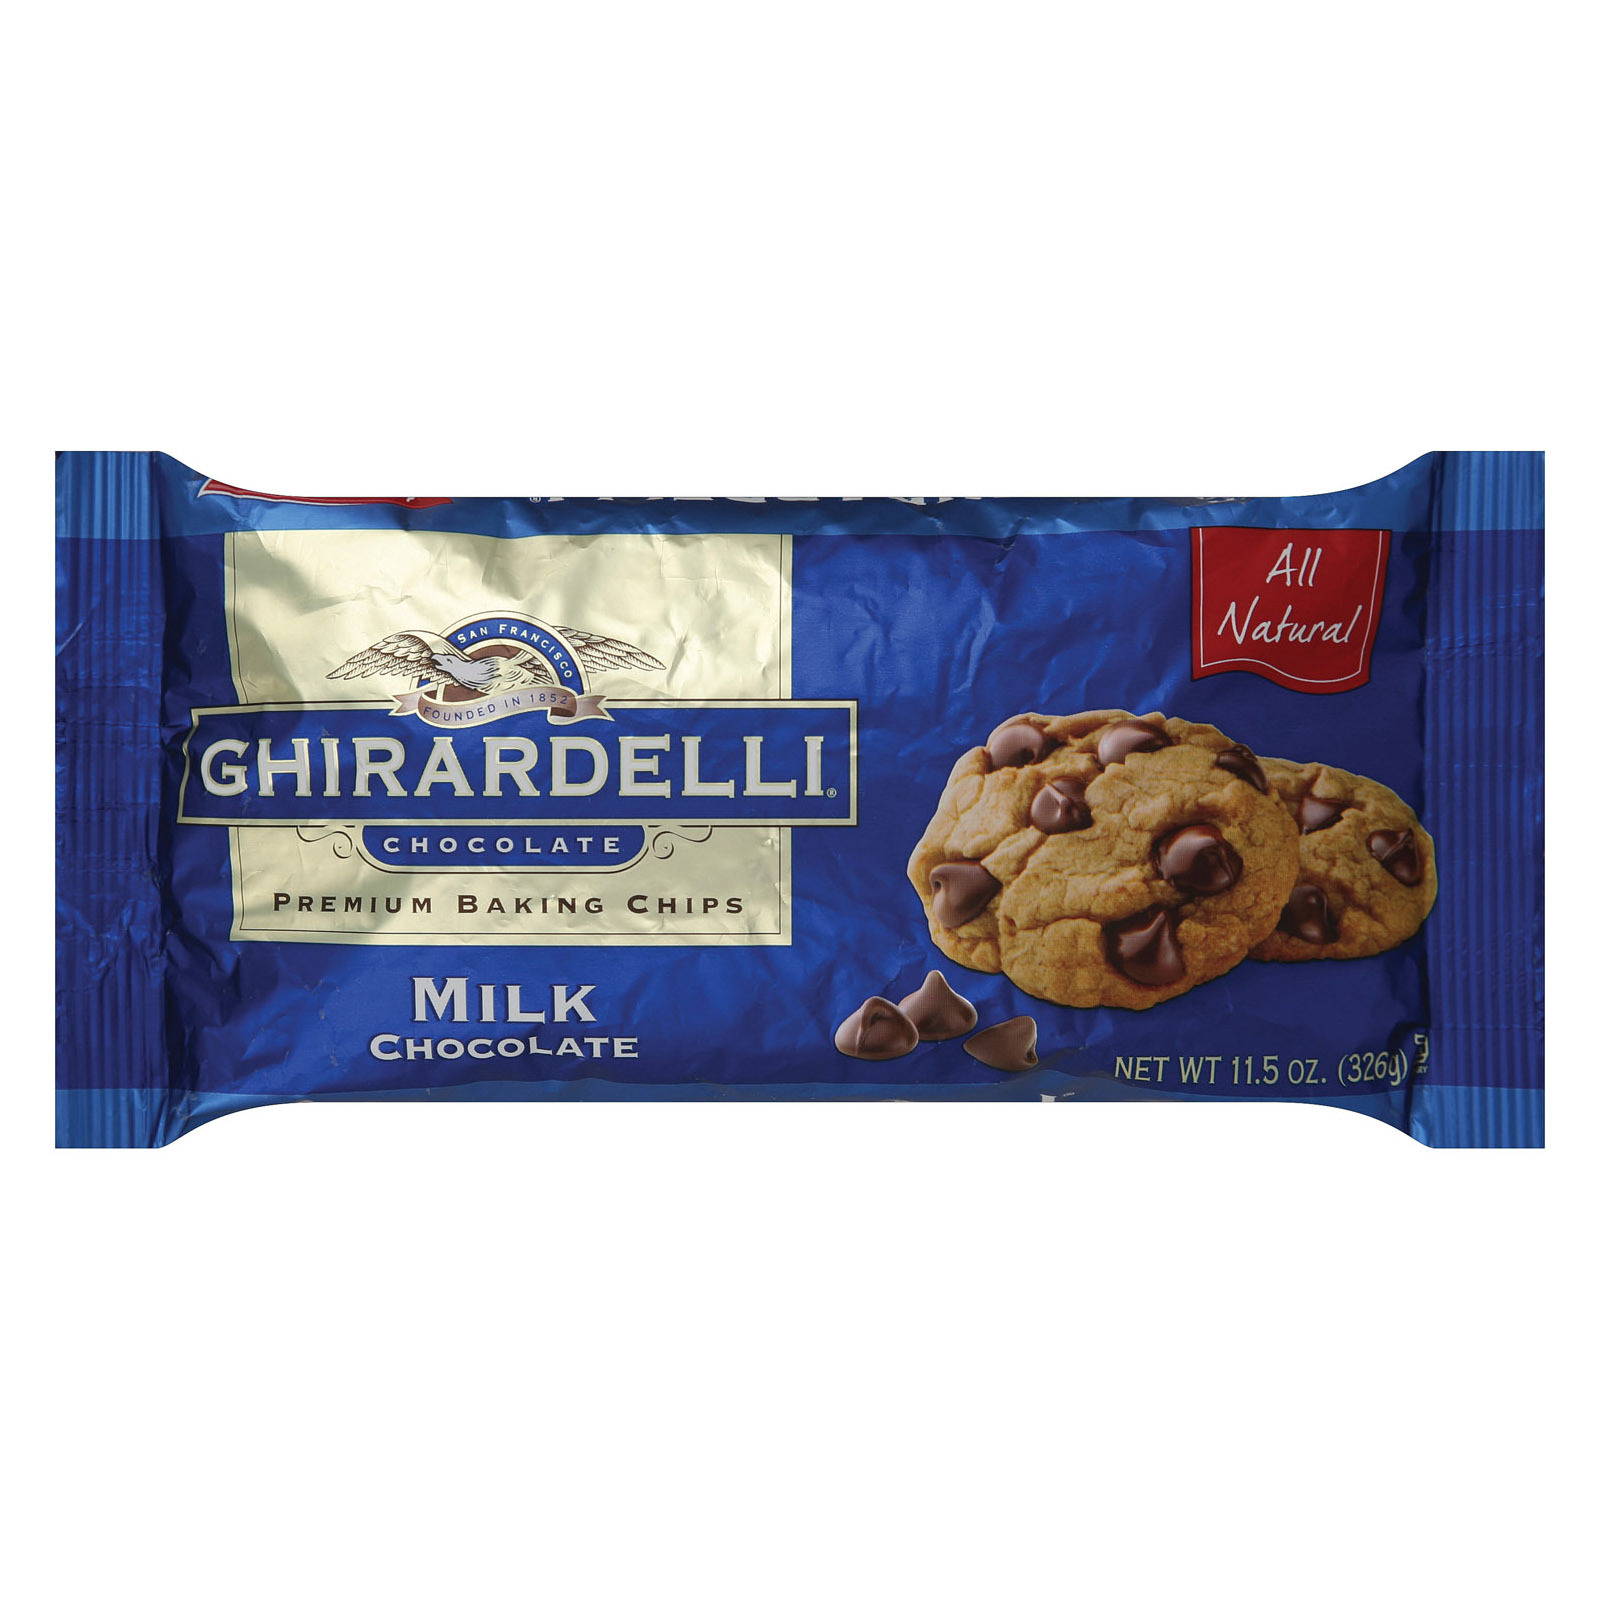 Ghirardelli Baking Chips - Milk Chocolate - Case of 12 - 11.5 oz.